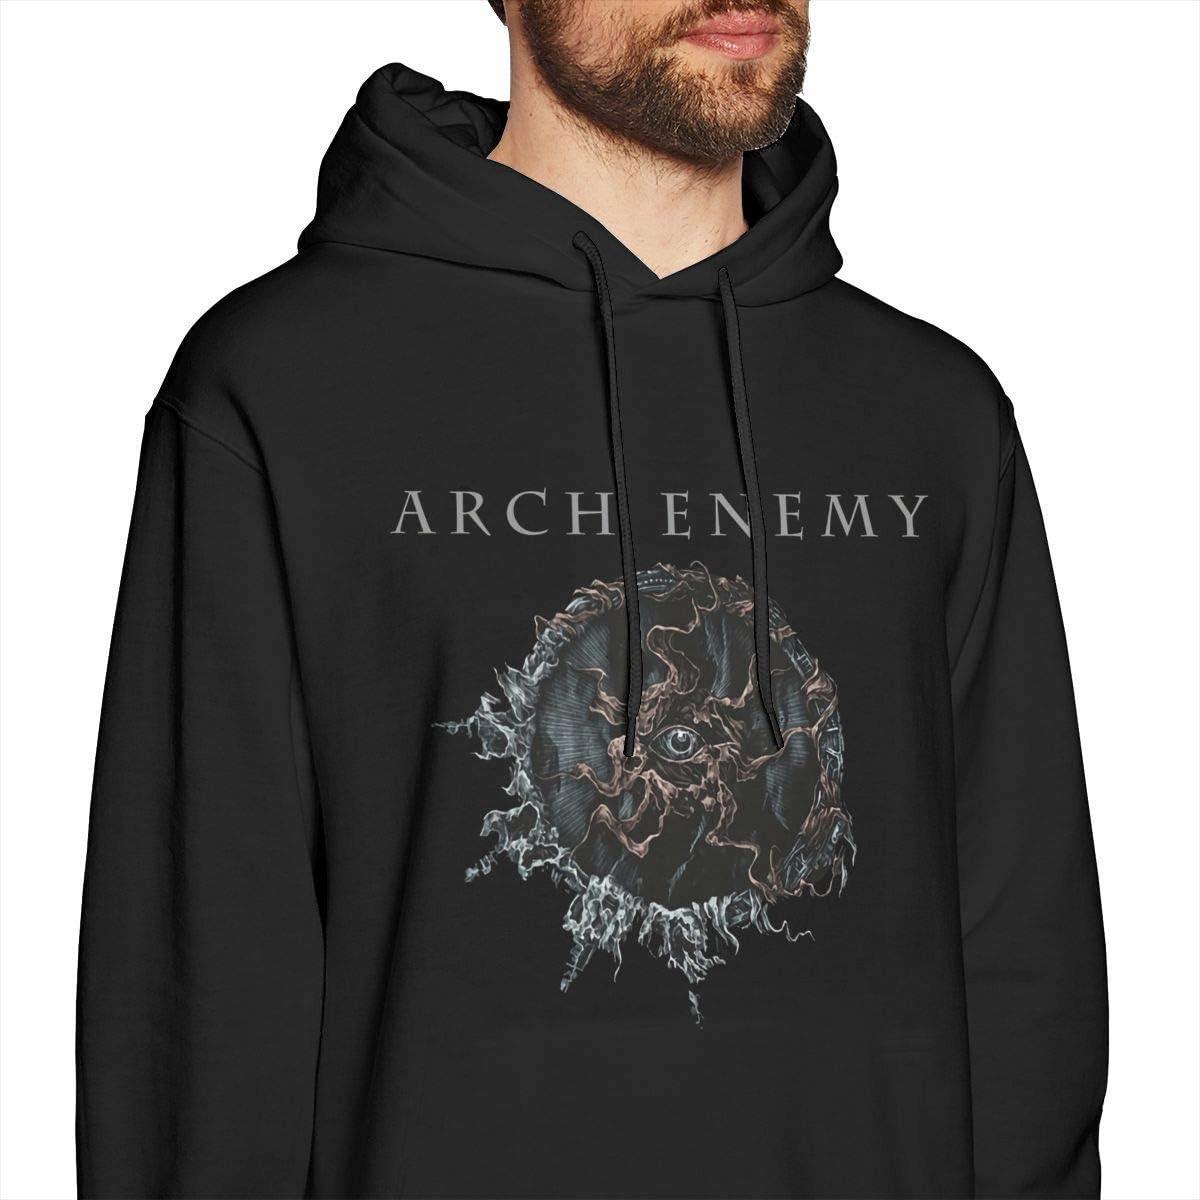 YCR4FC Arch Enemy Mens Hoodie Sweatshirt Heavyweight Casual Long Sleeve Tshirt